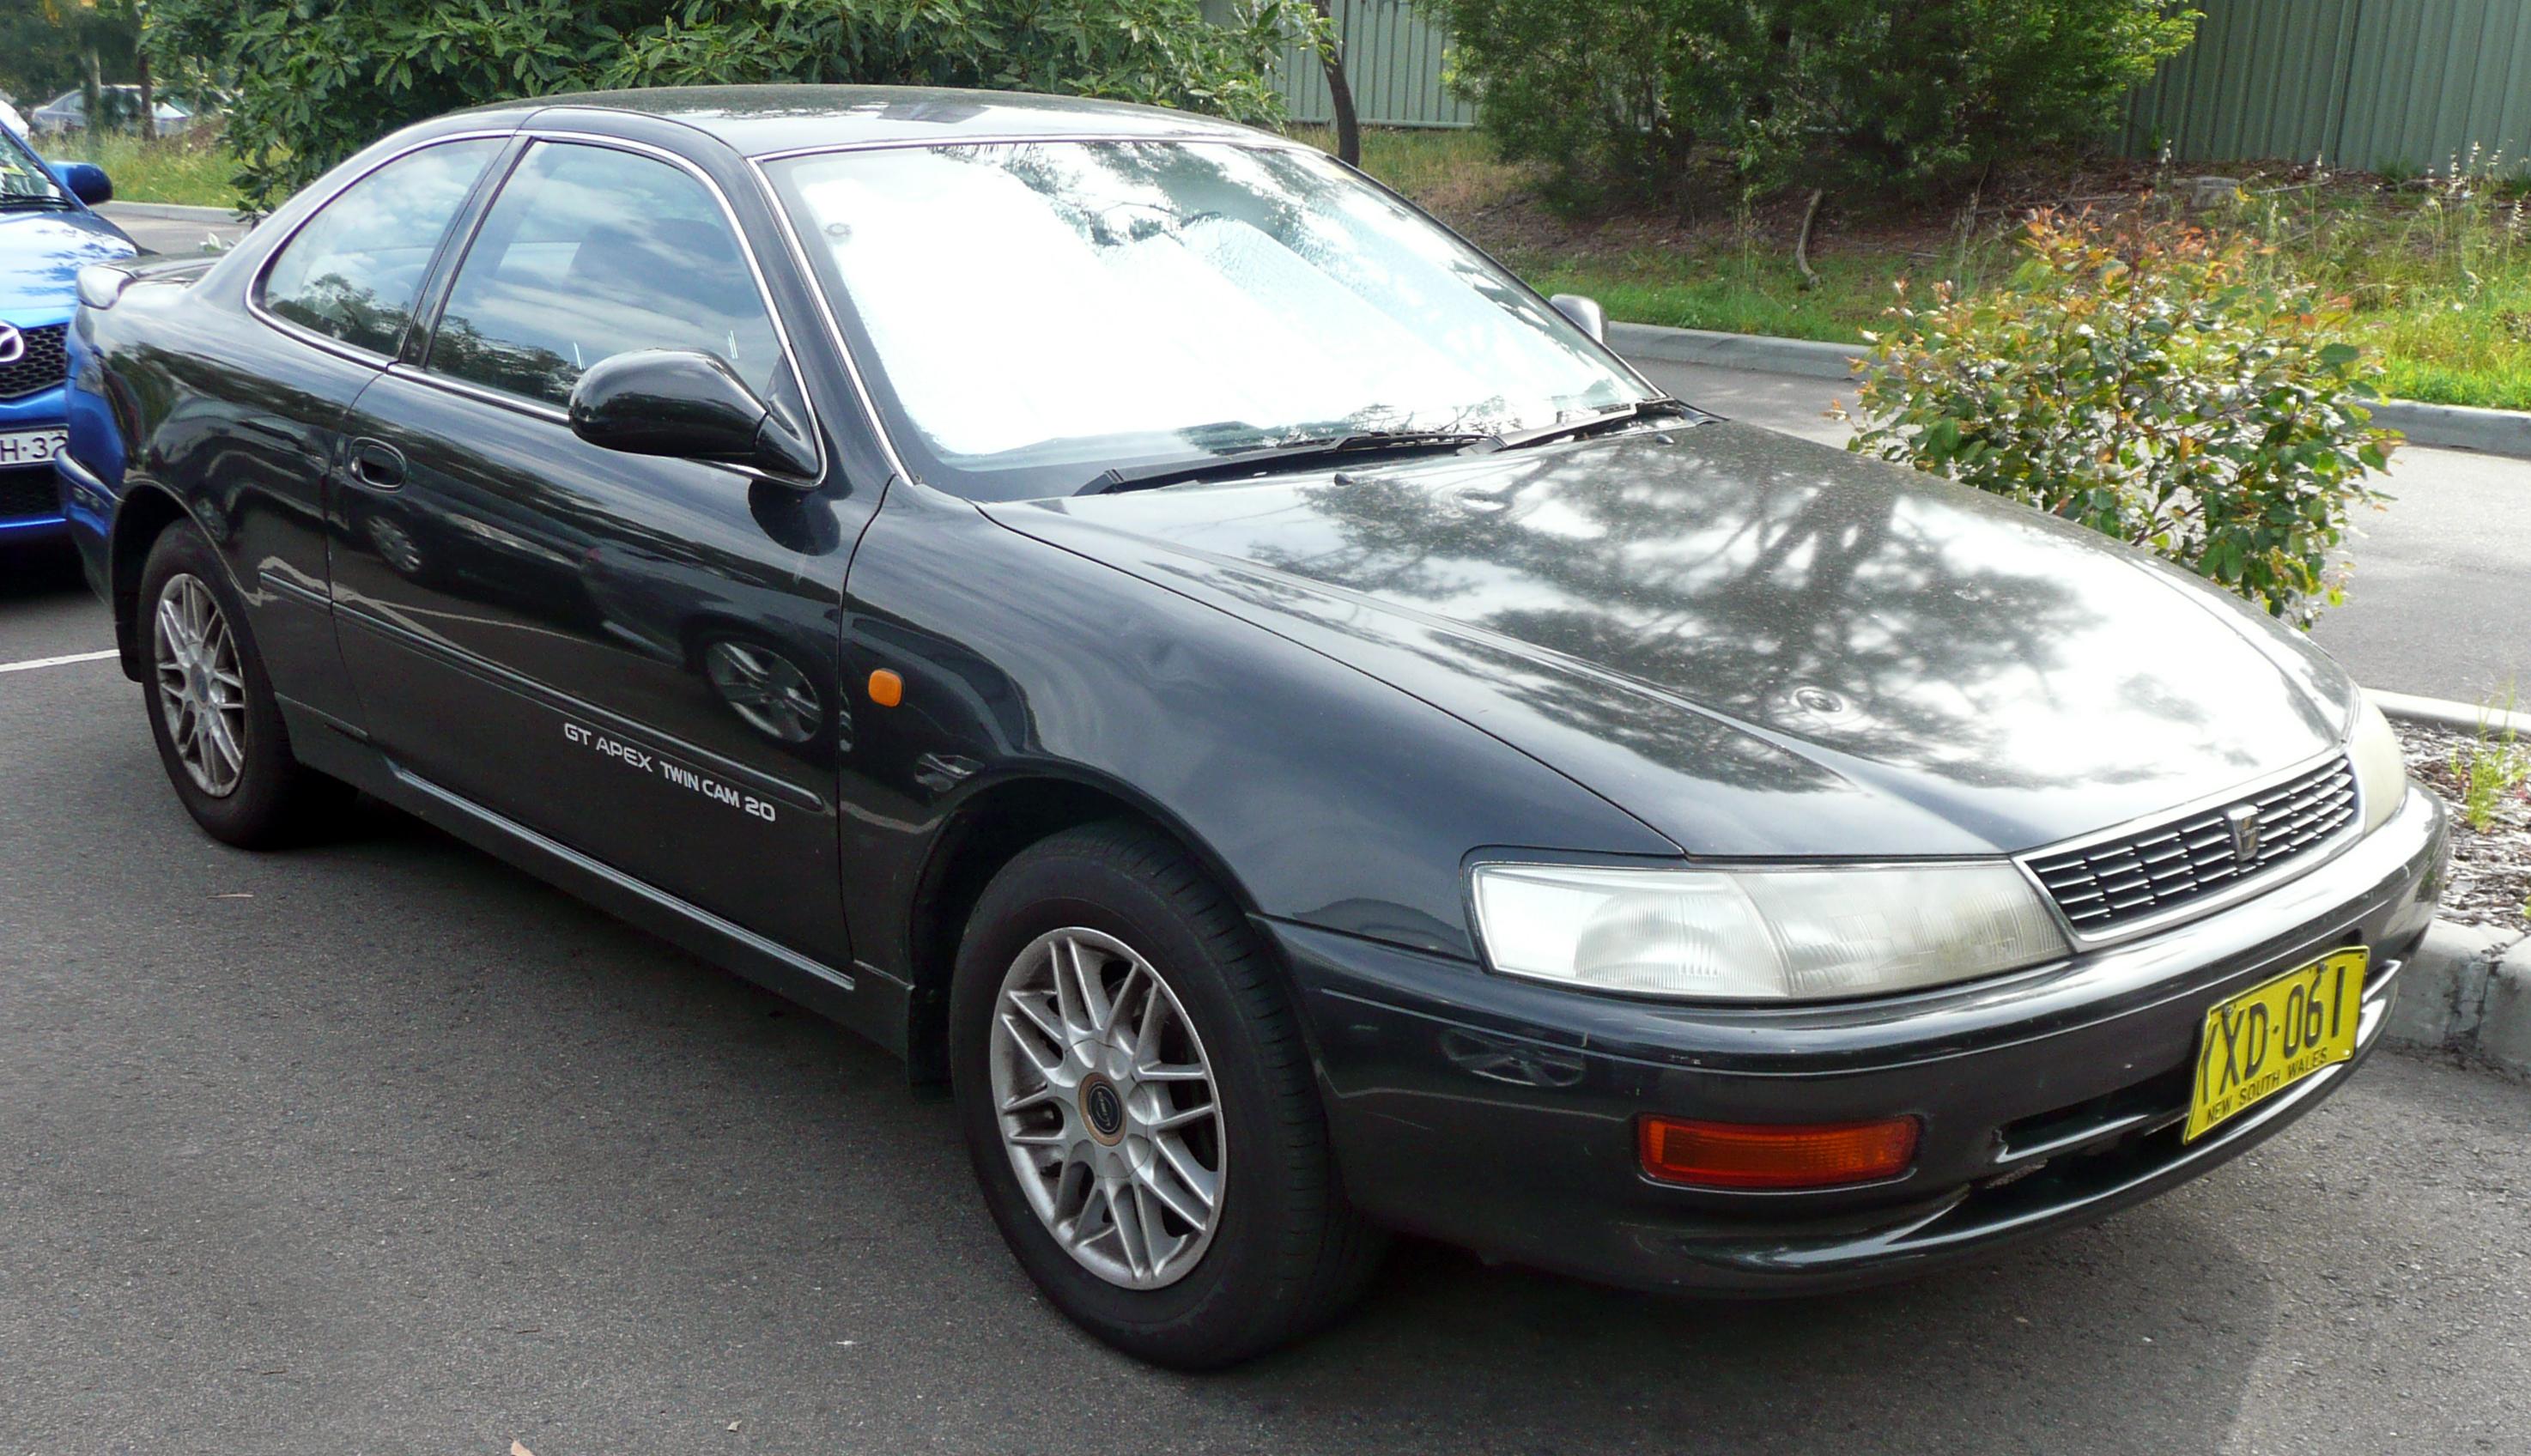 File:1993-1995 Toyota Corolla Levin (AE101) GT Apex coupe ...